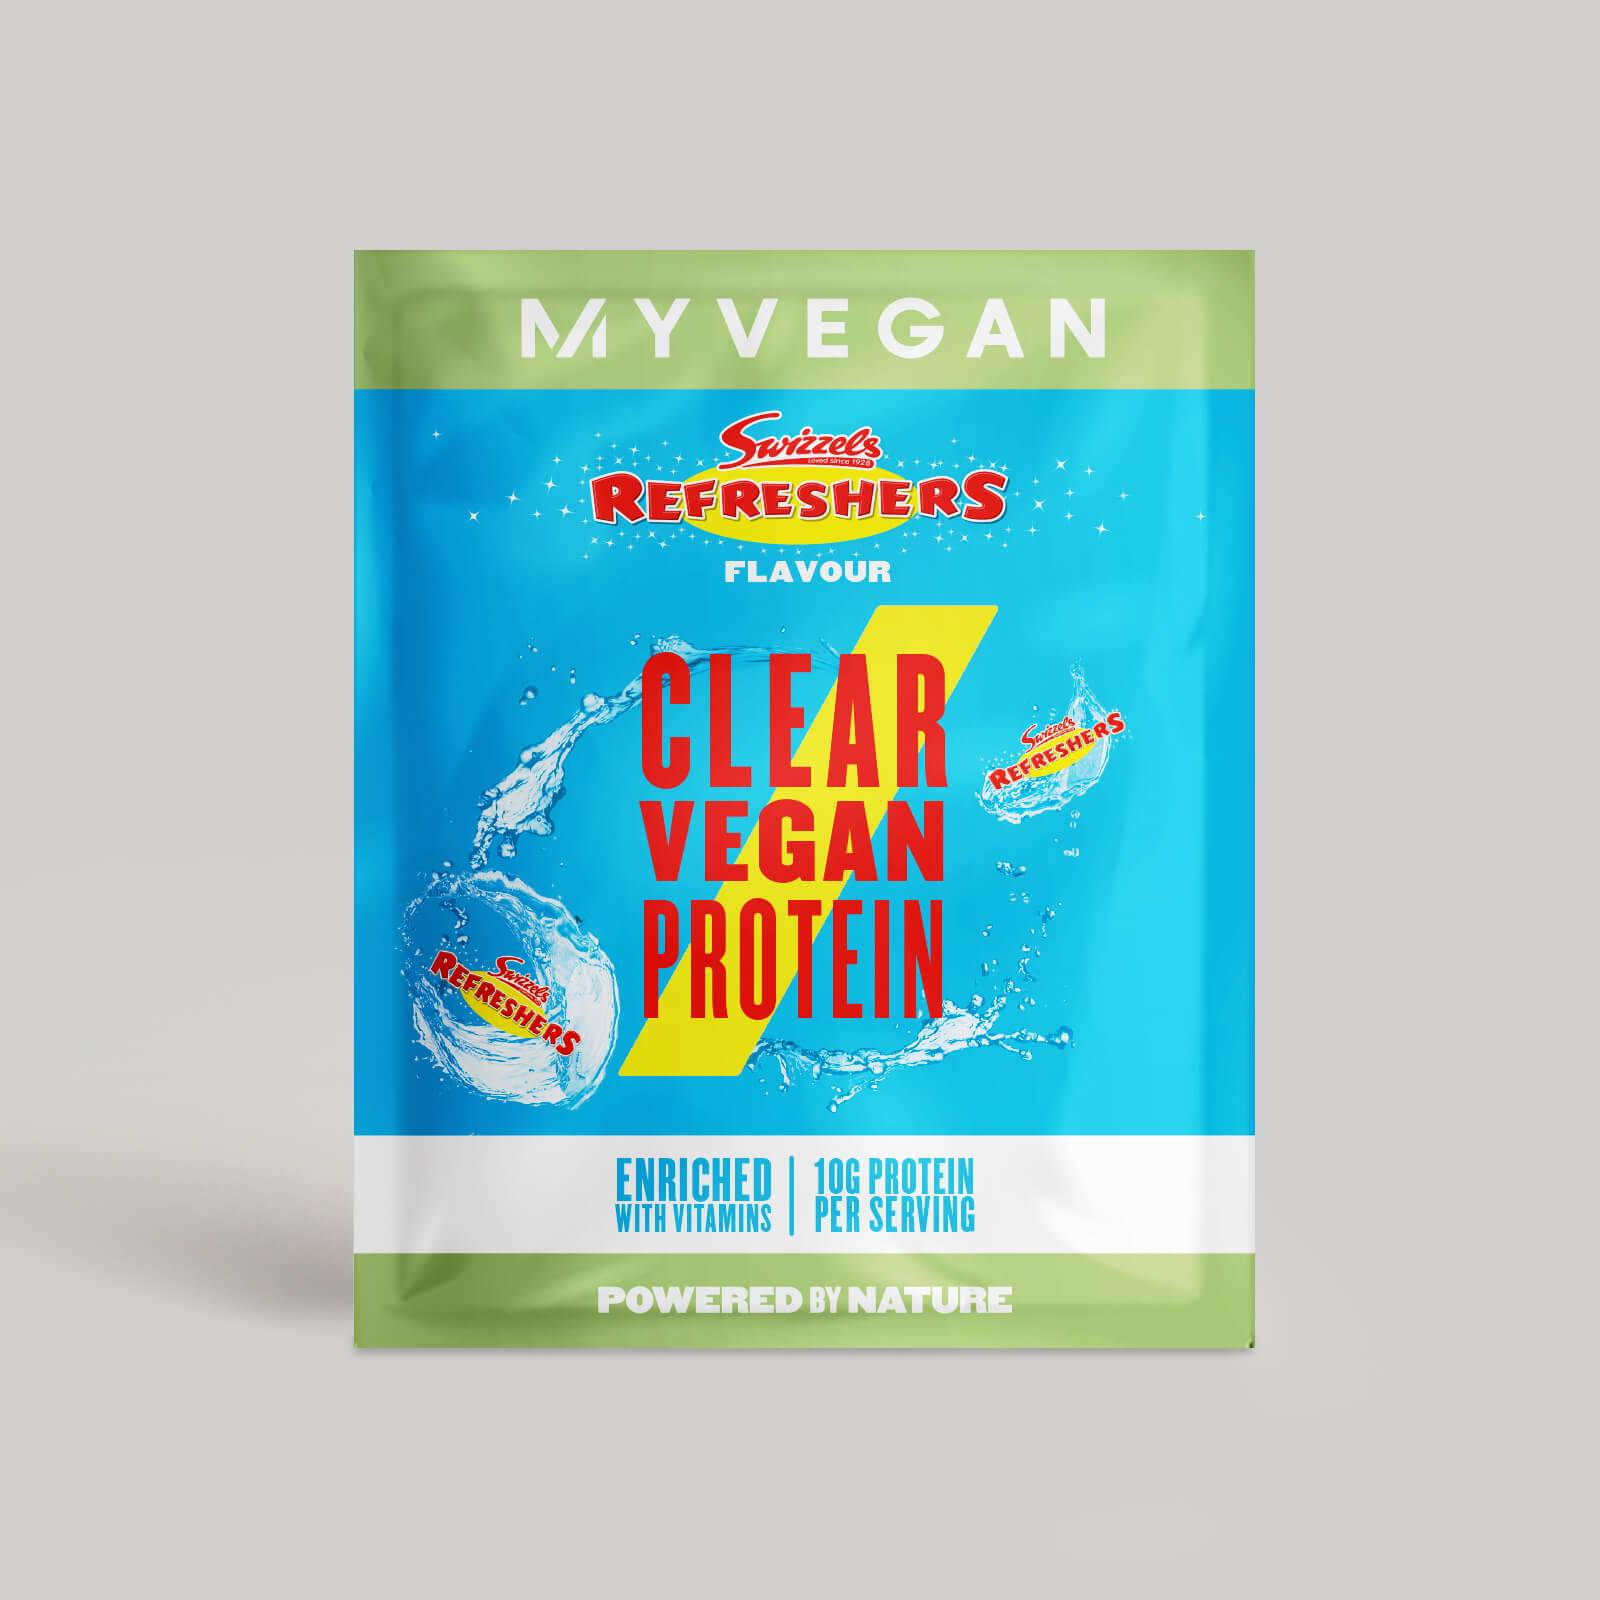 Myvegan Clear Vegan Protein, 16g (Sample) - Swizzels - Refreshers